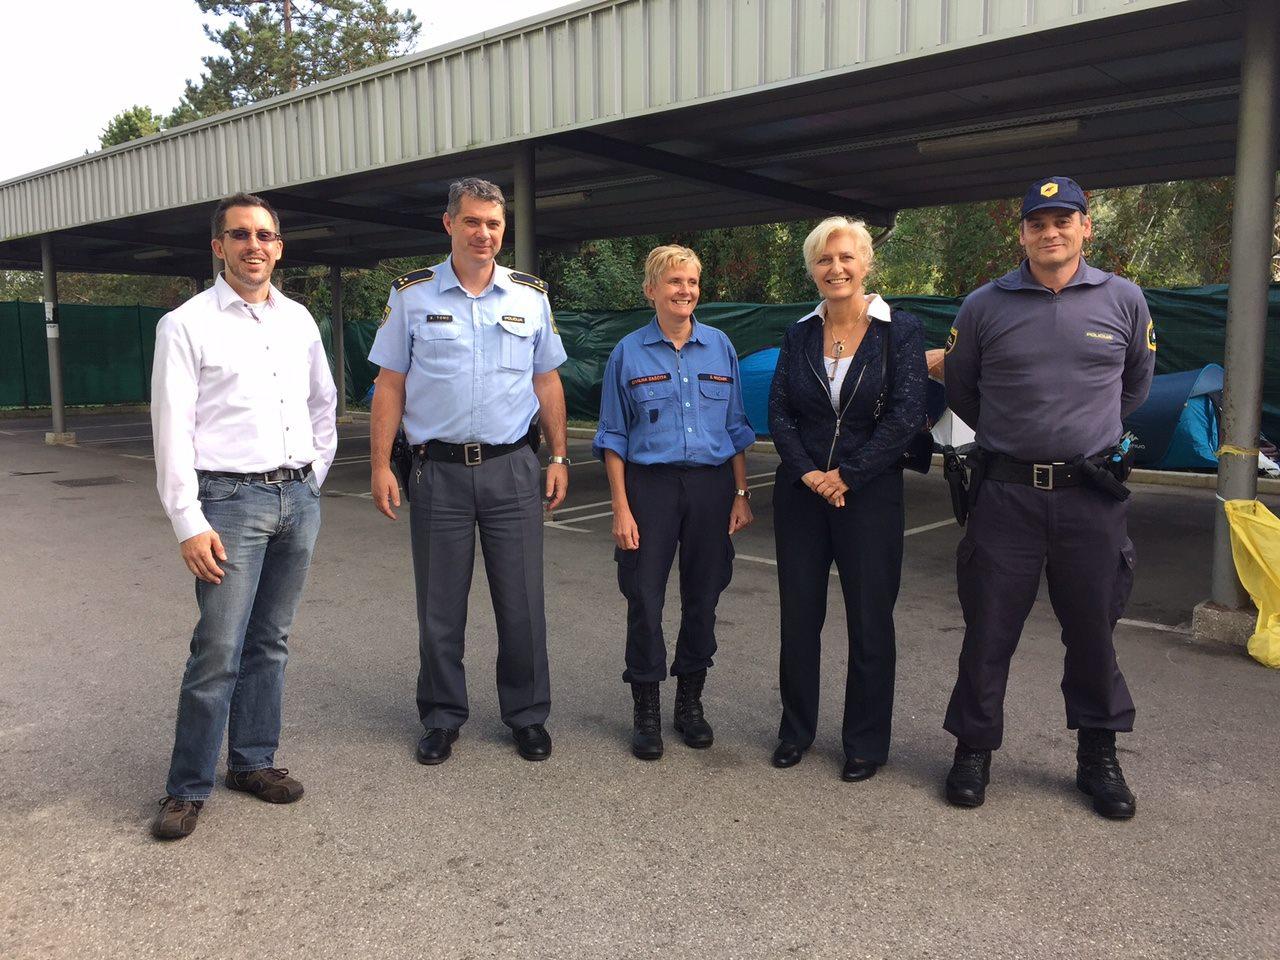 Foto_-_Brezice_Police_Reception_Registeration_with_German_Embassador